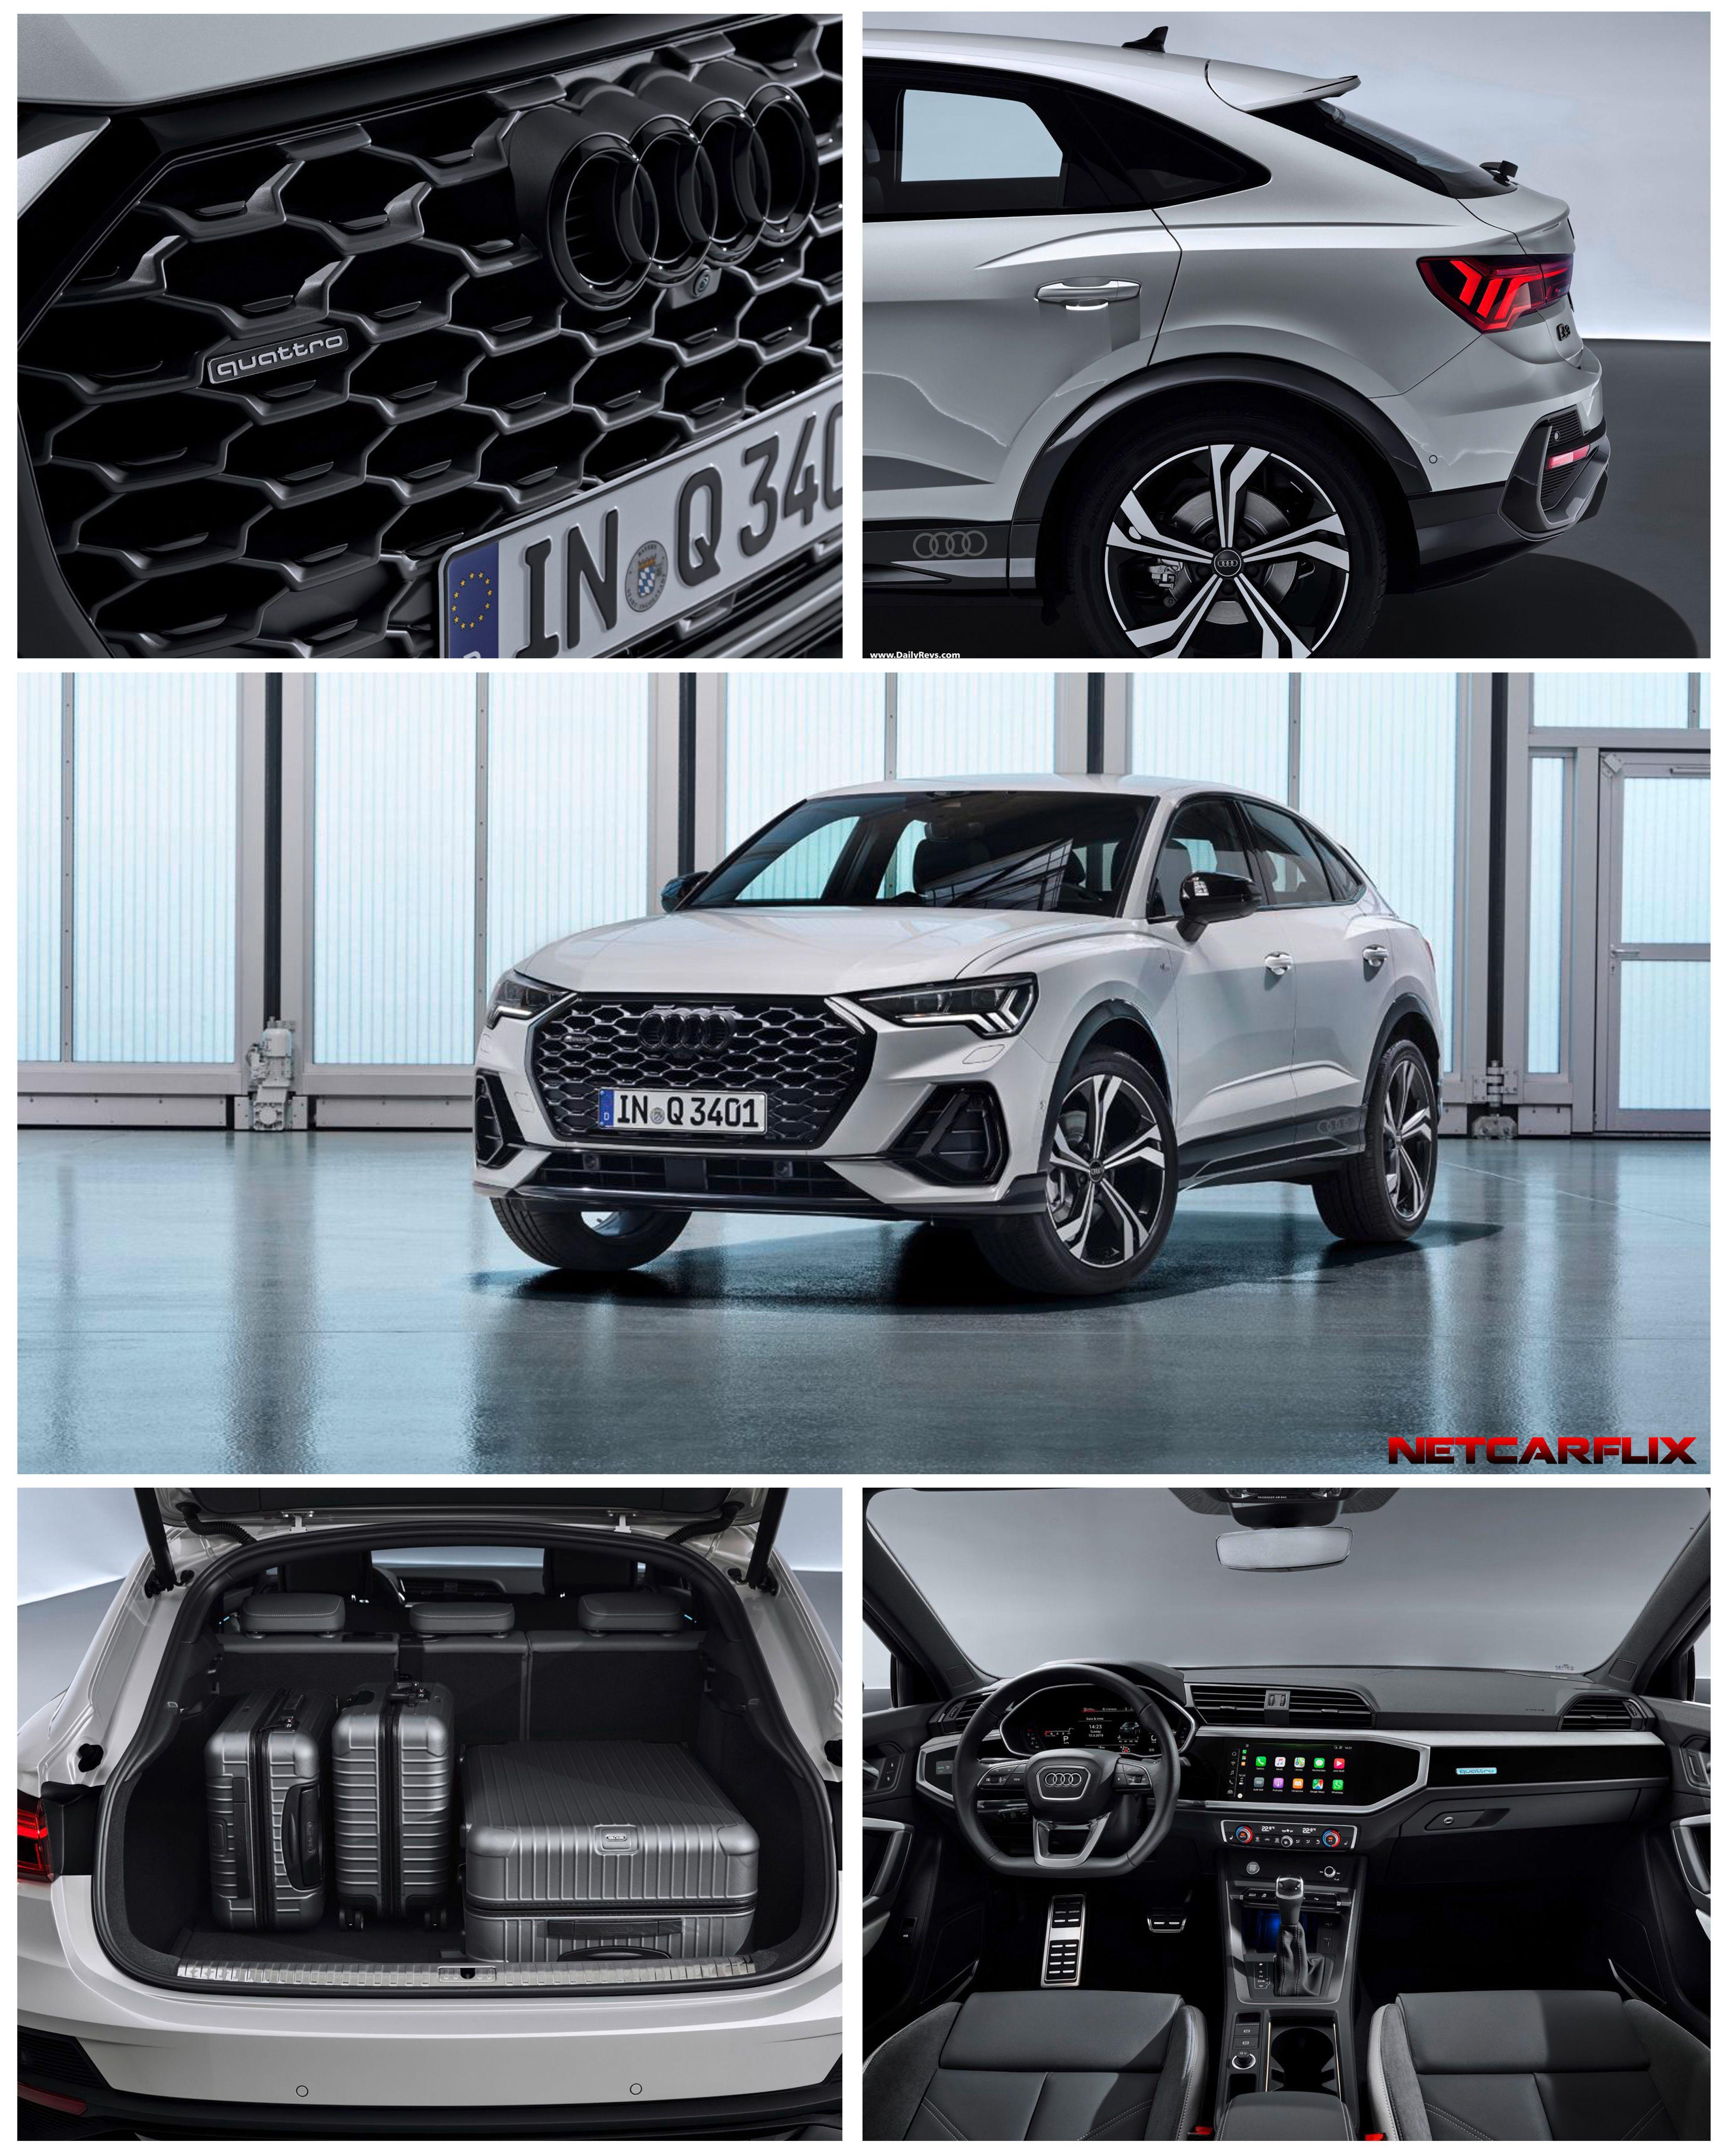 2020 Audi Q3 Sportback Hq Pictures Specs Information Videos Dailyrevs Audi Q3 Audi Car Models Audi